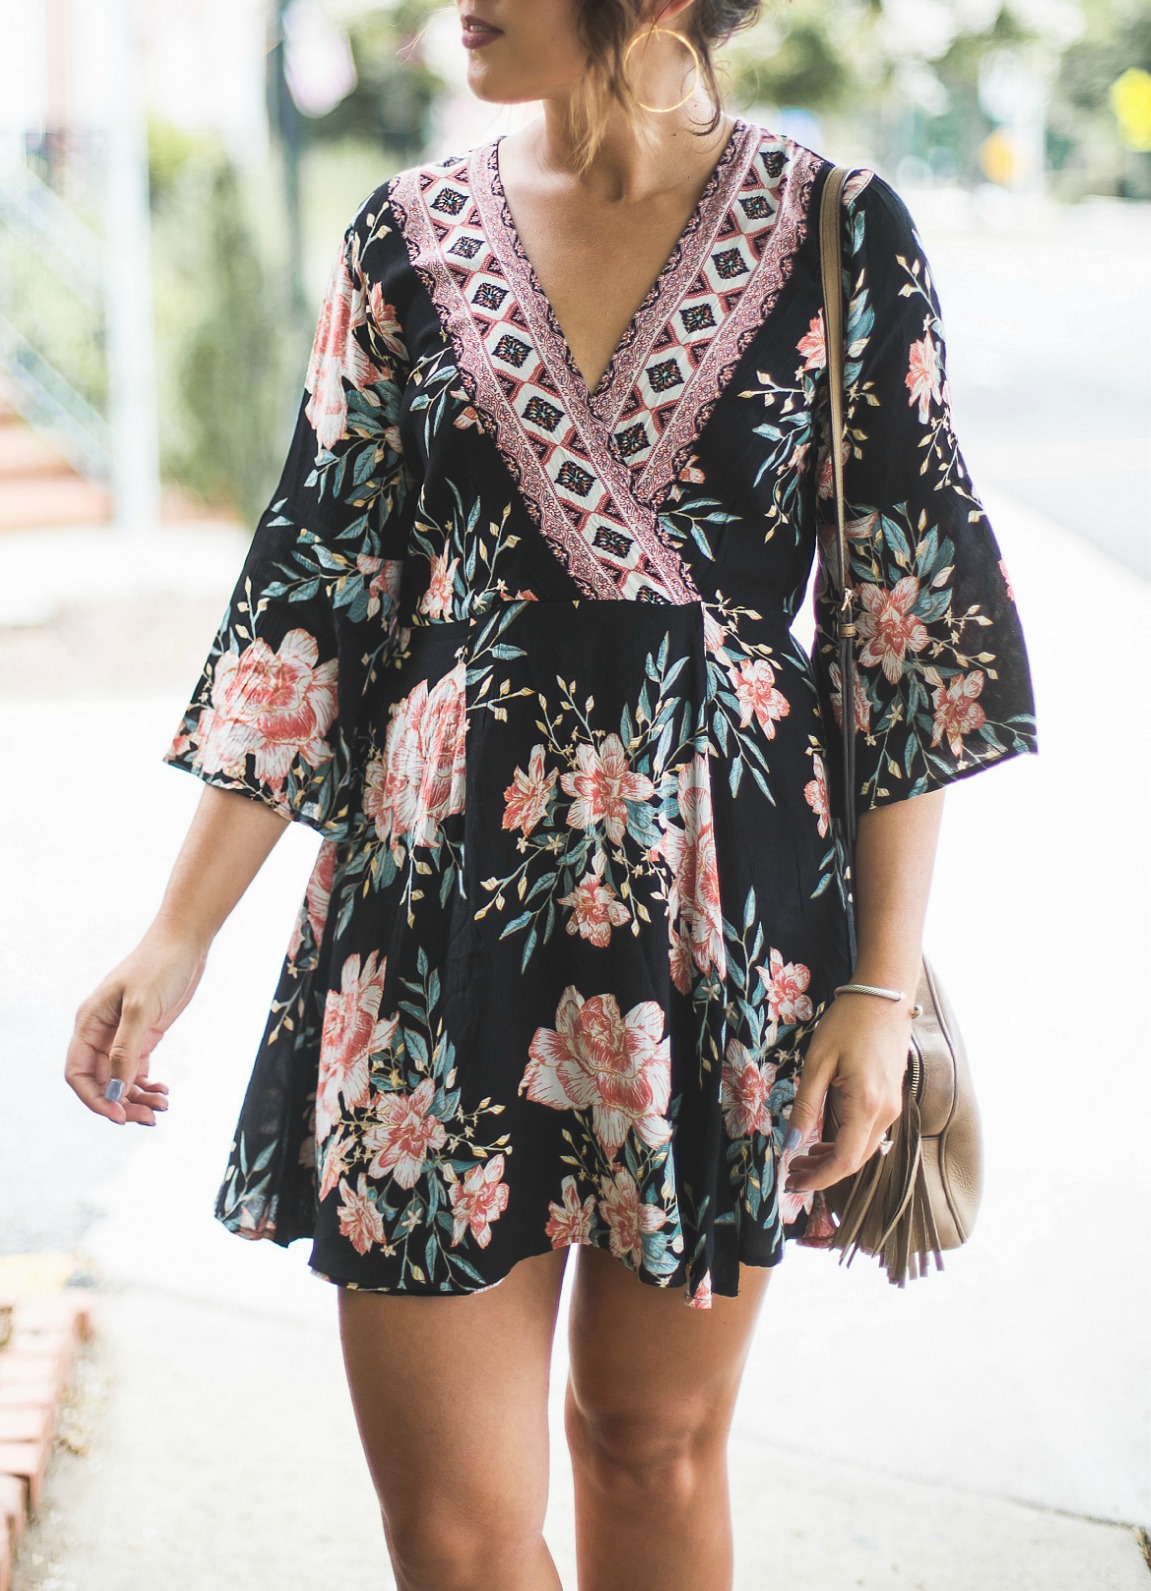 Billabong Divine Floral Dress, gucci soho disco, boho dress, floral dress